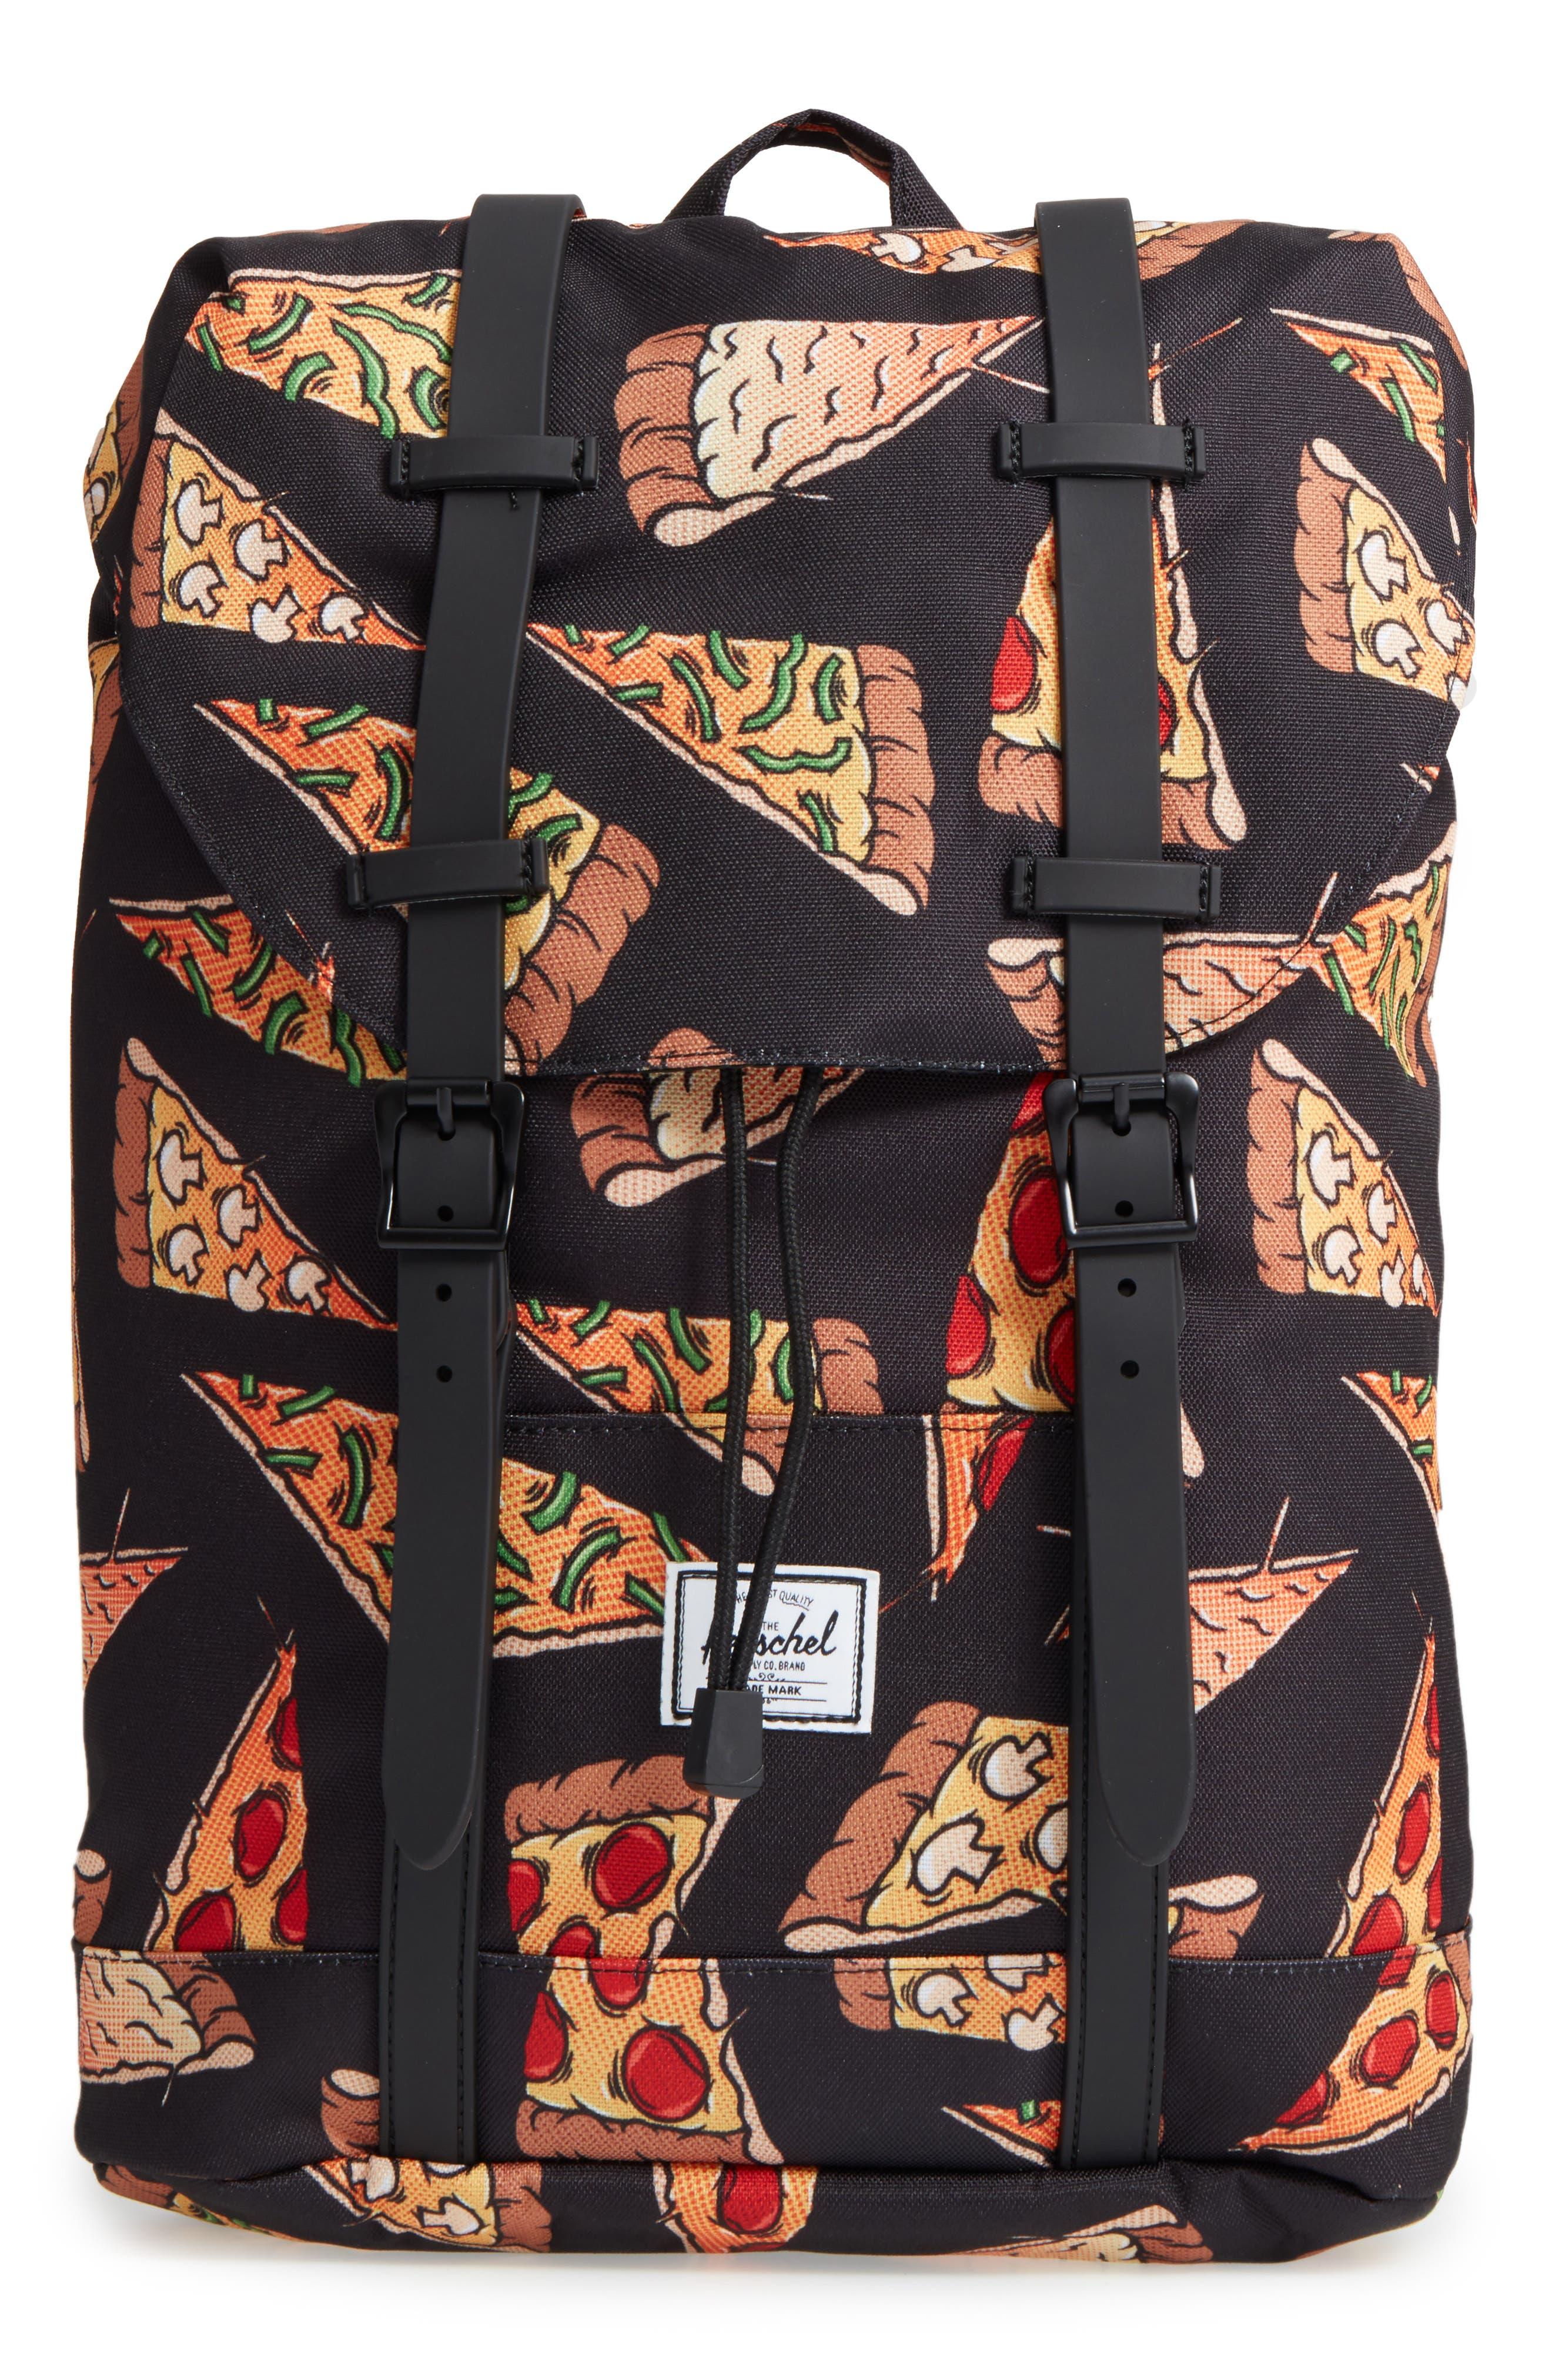 Retreat Backpack,                         Main,                         color, 001